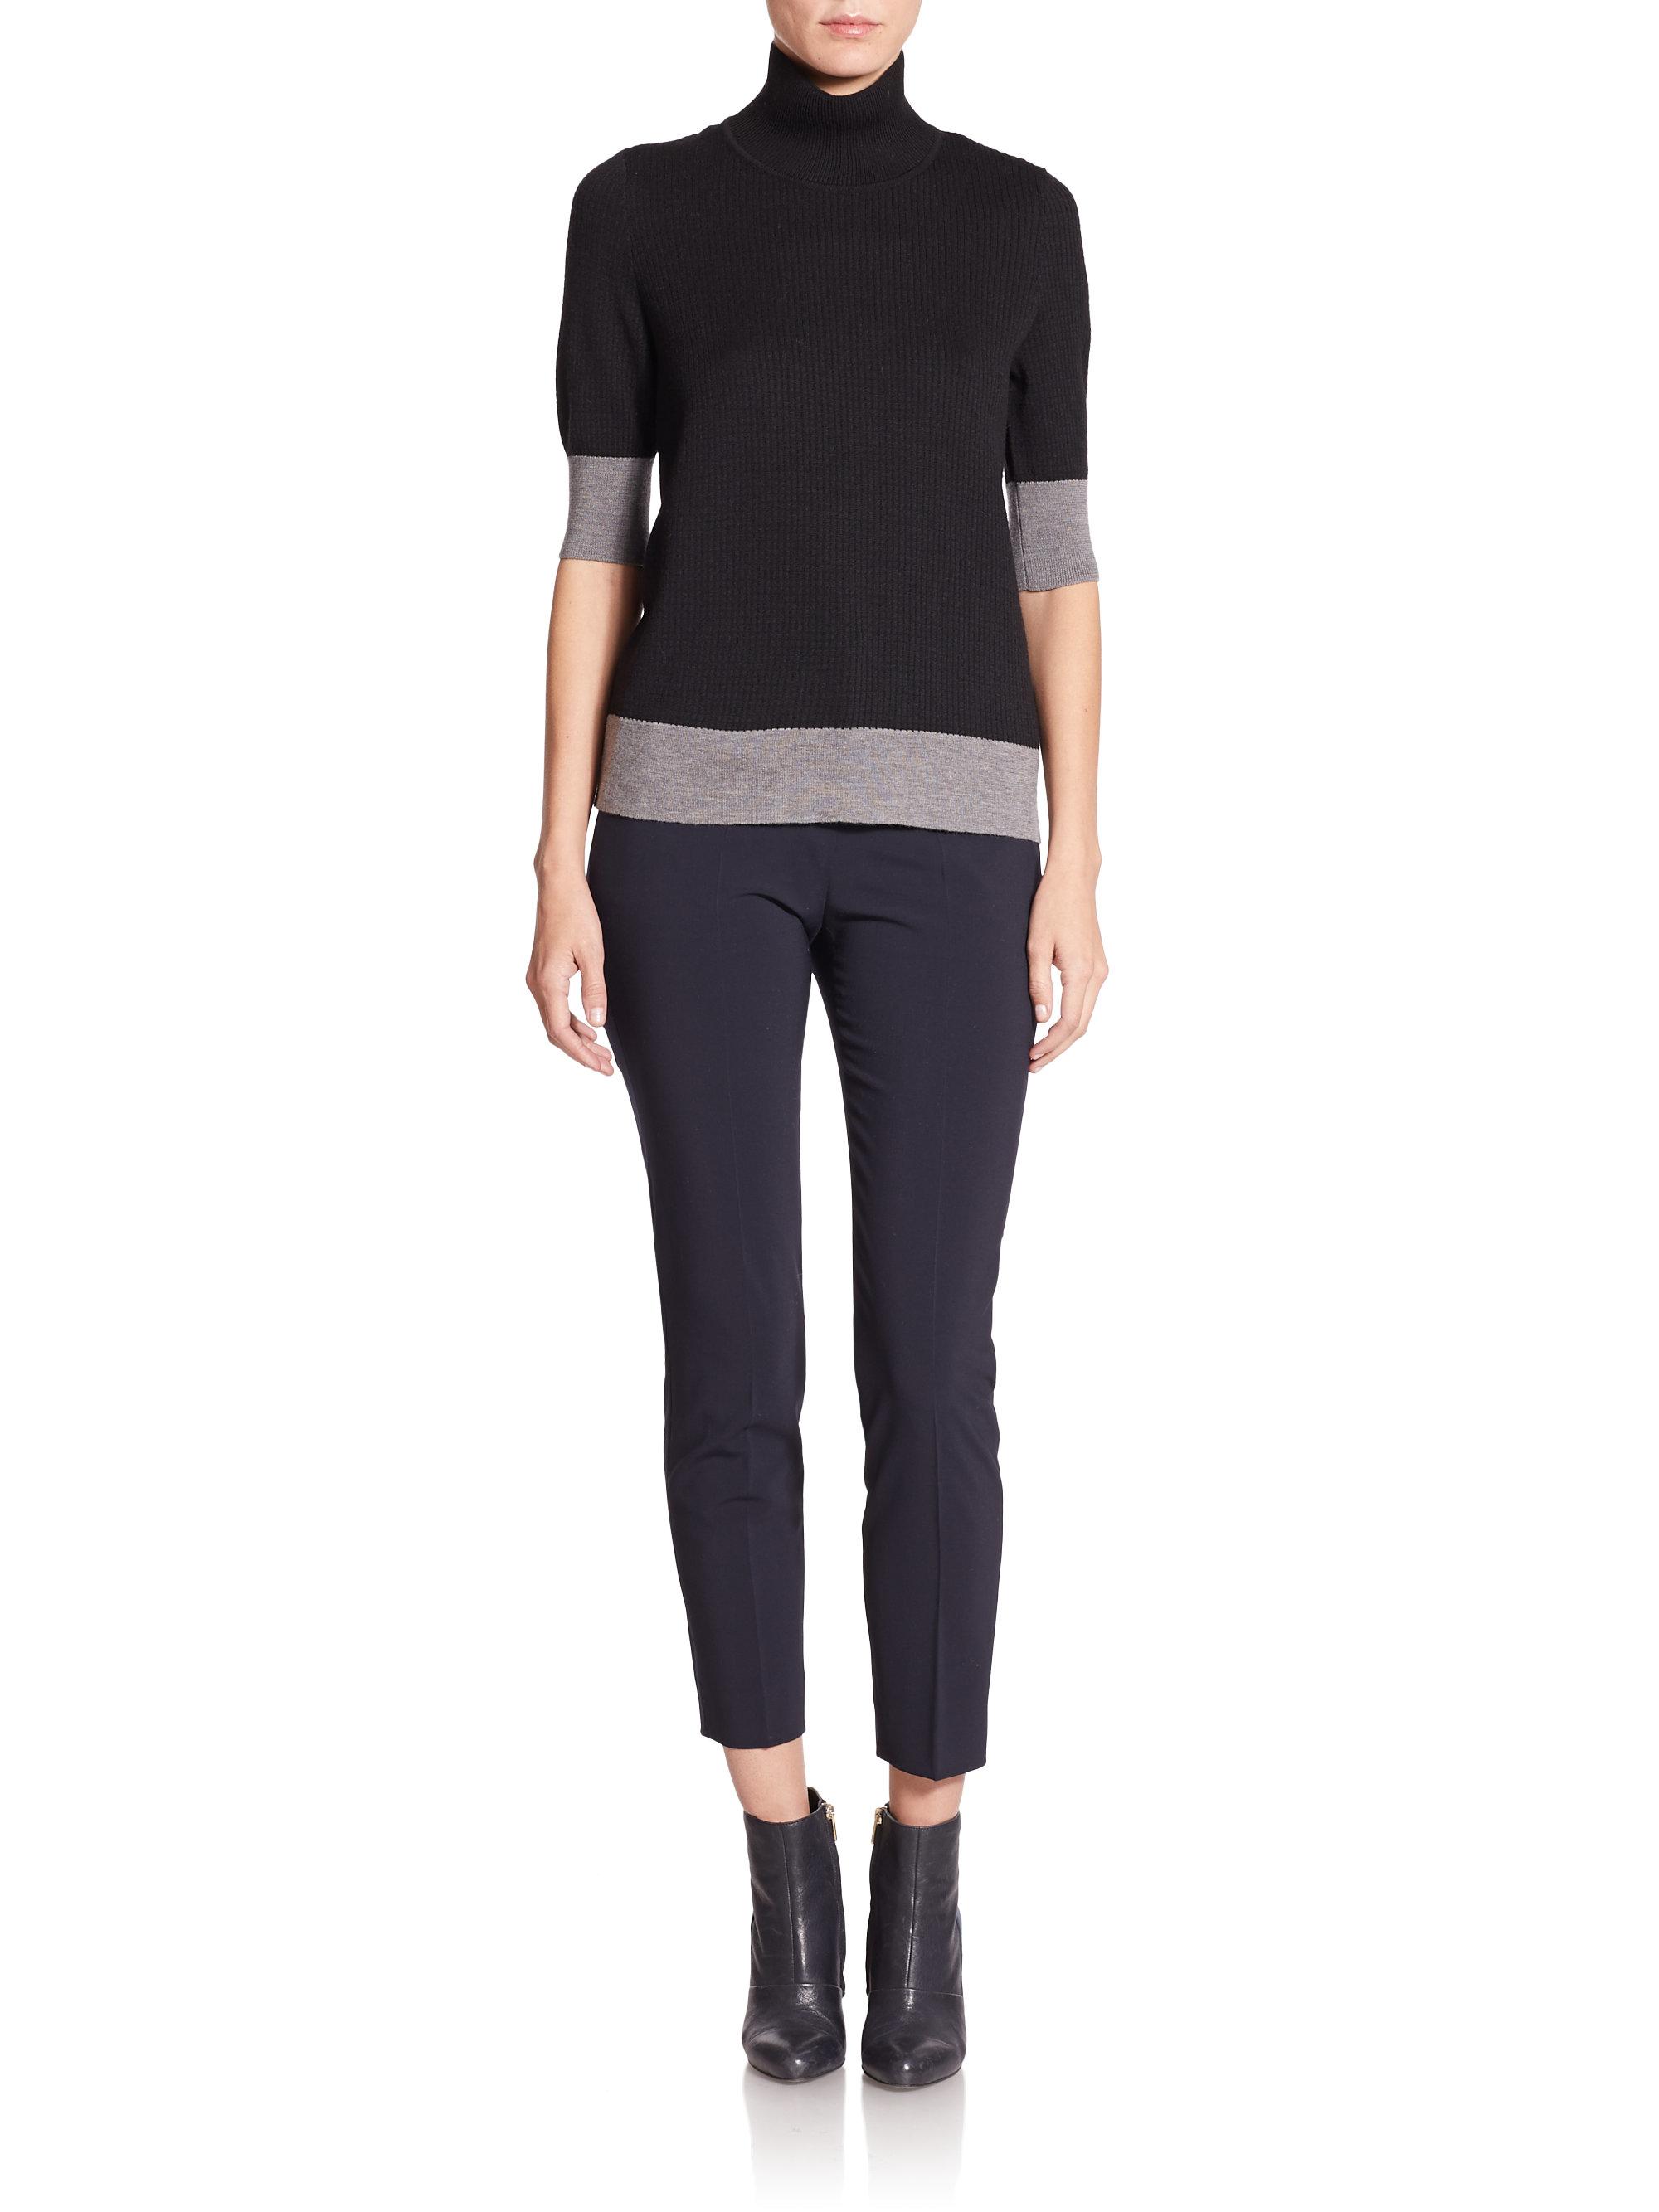 Turtleneck Lyst In Piazza Black Sweater Sempione Colorblock Wool rInc6WwFIq